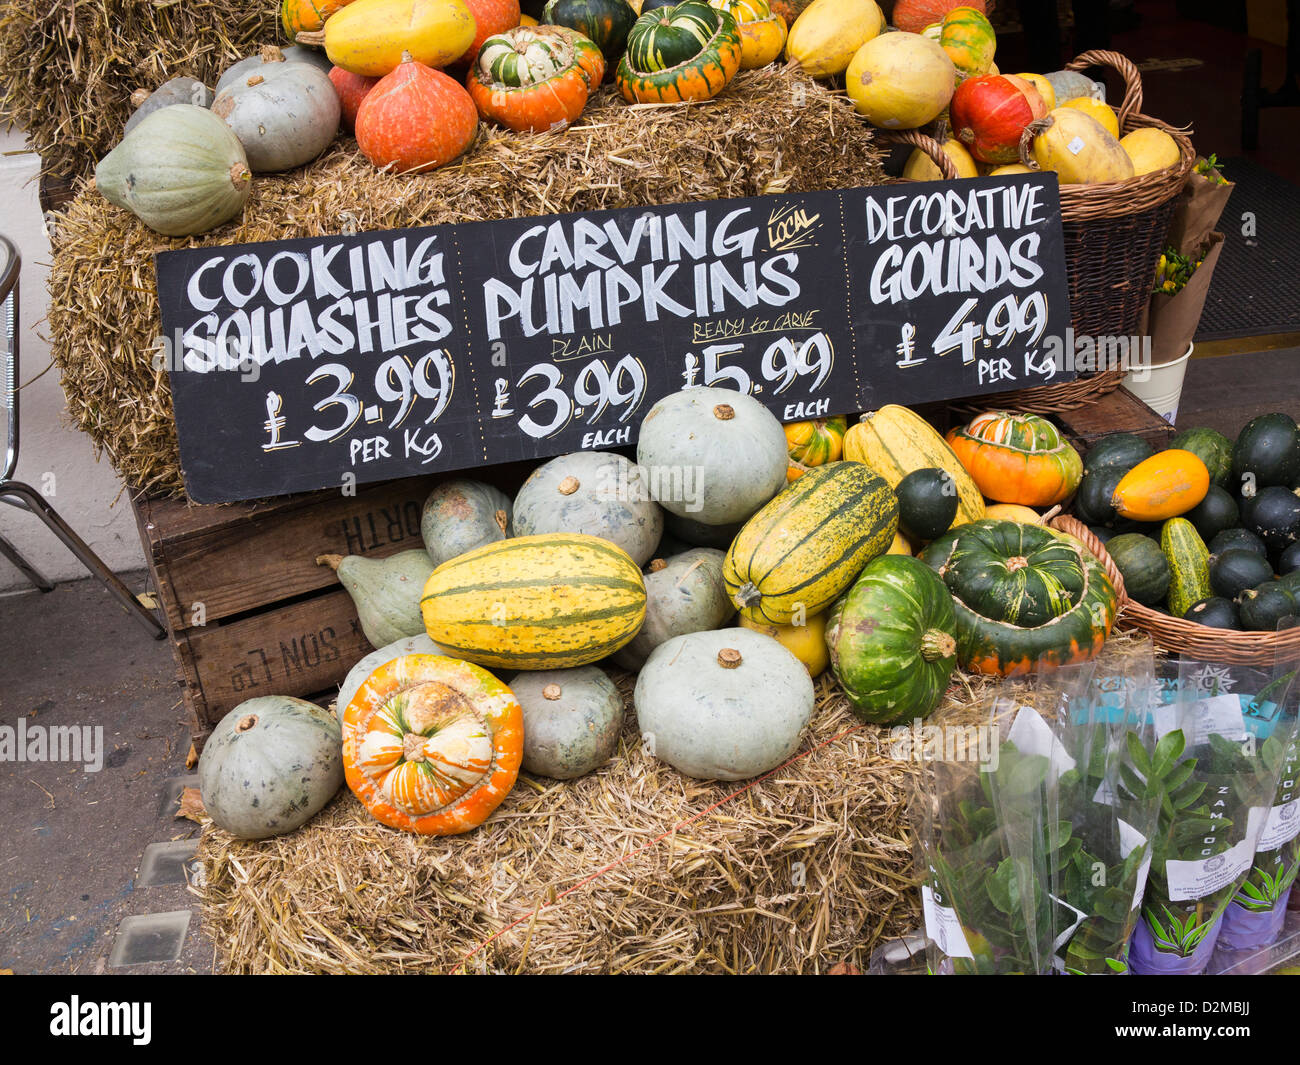 Pumpkins on a stall, UK - Stock Image